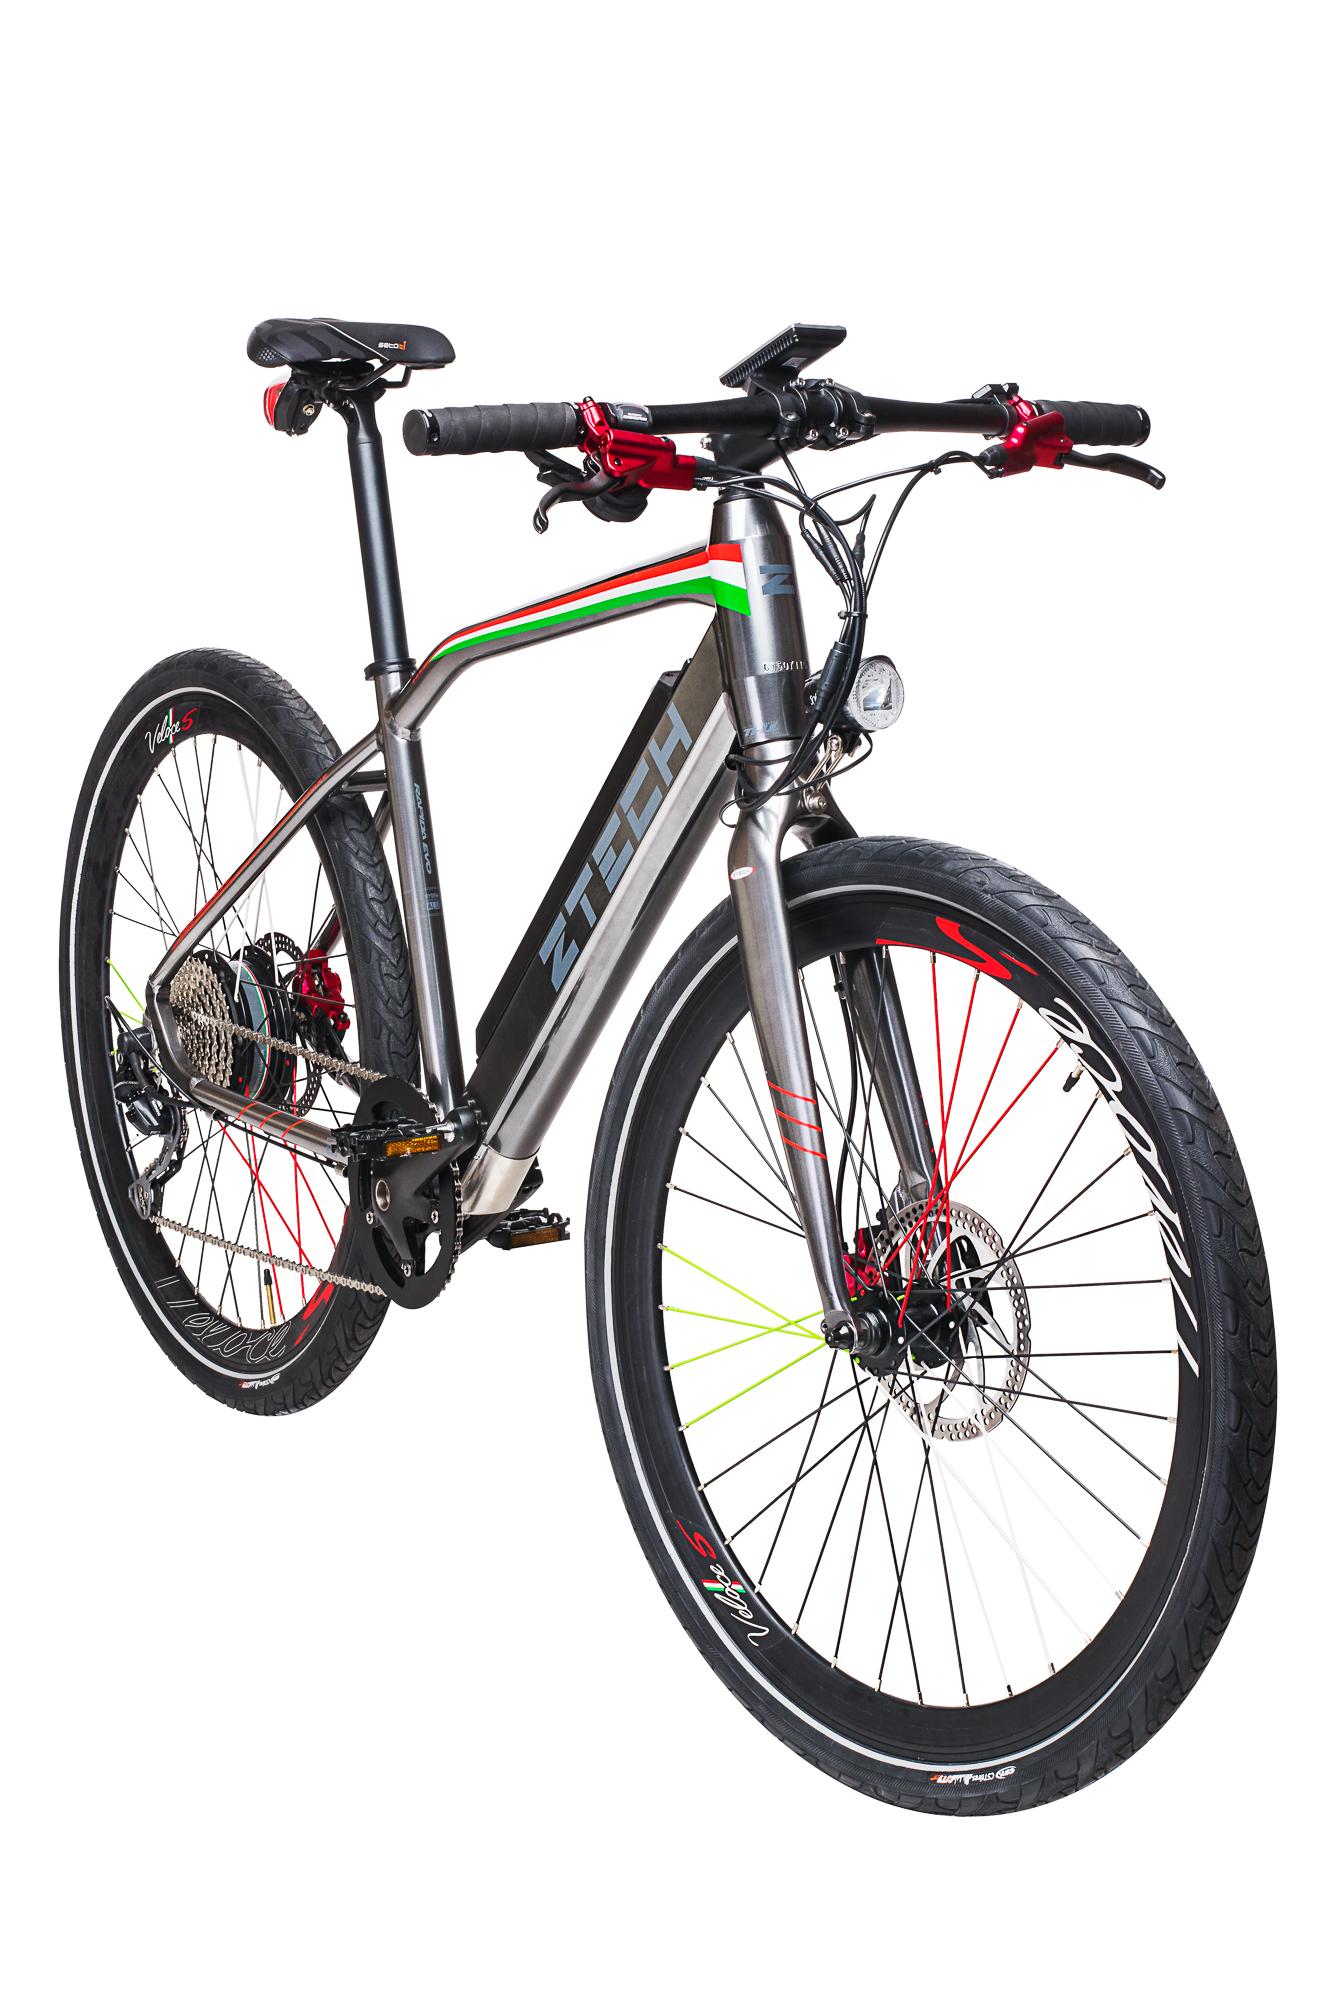 Bicicleta electrica MTB Ztech ZT-85 Rapid